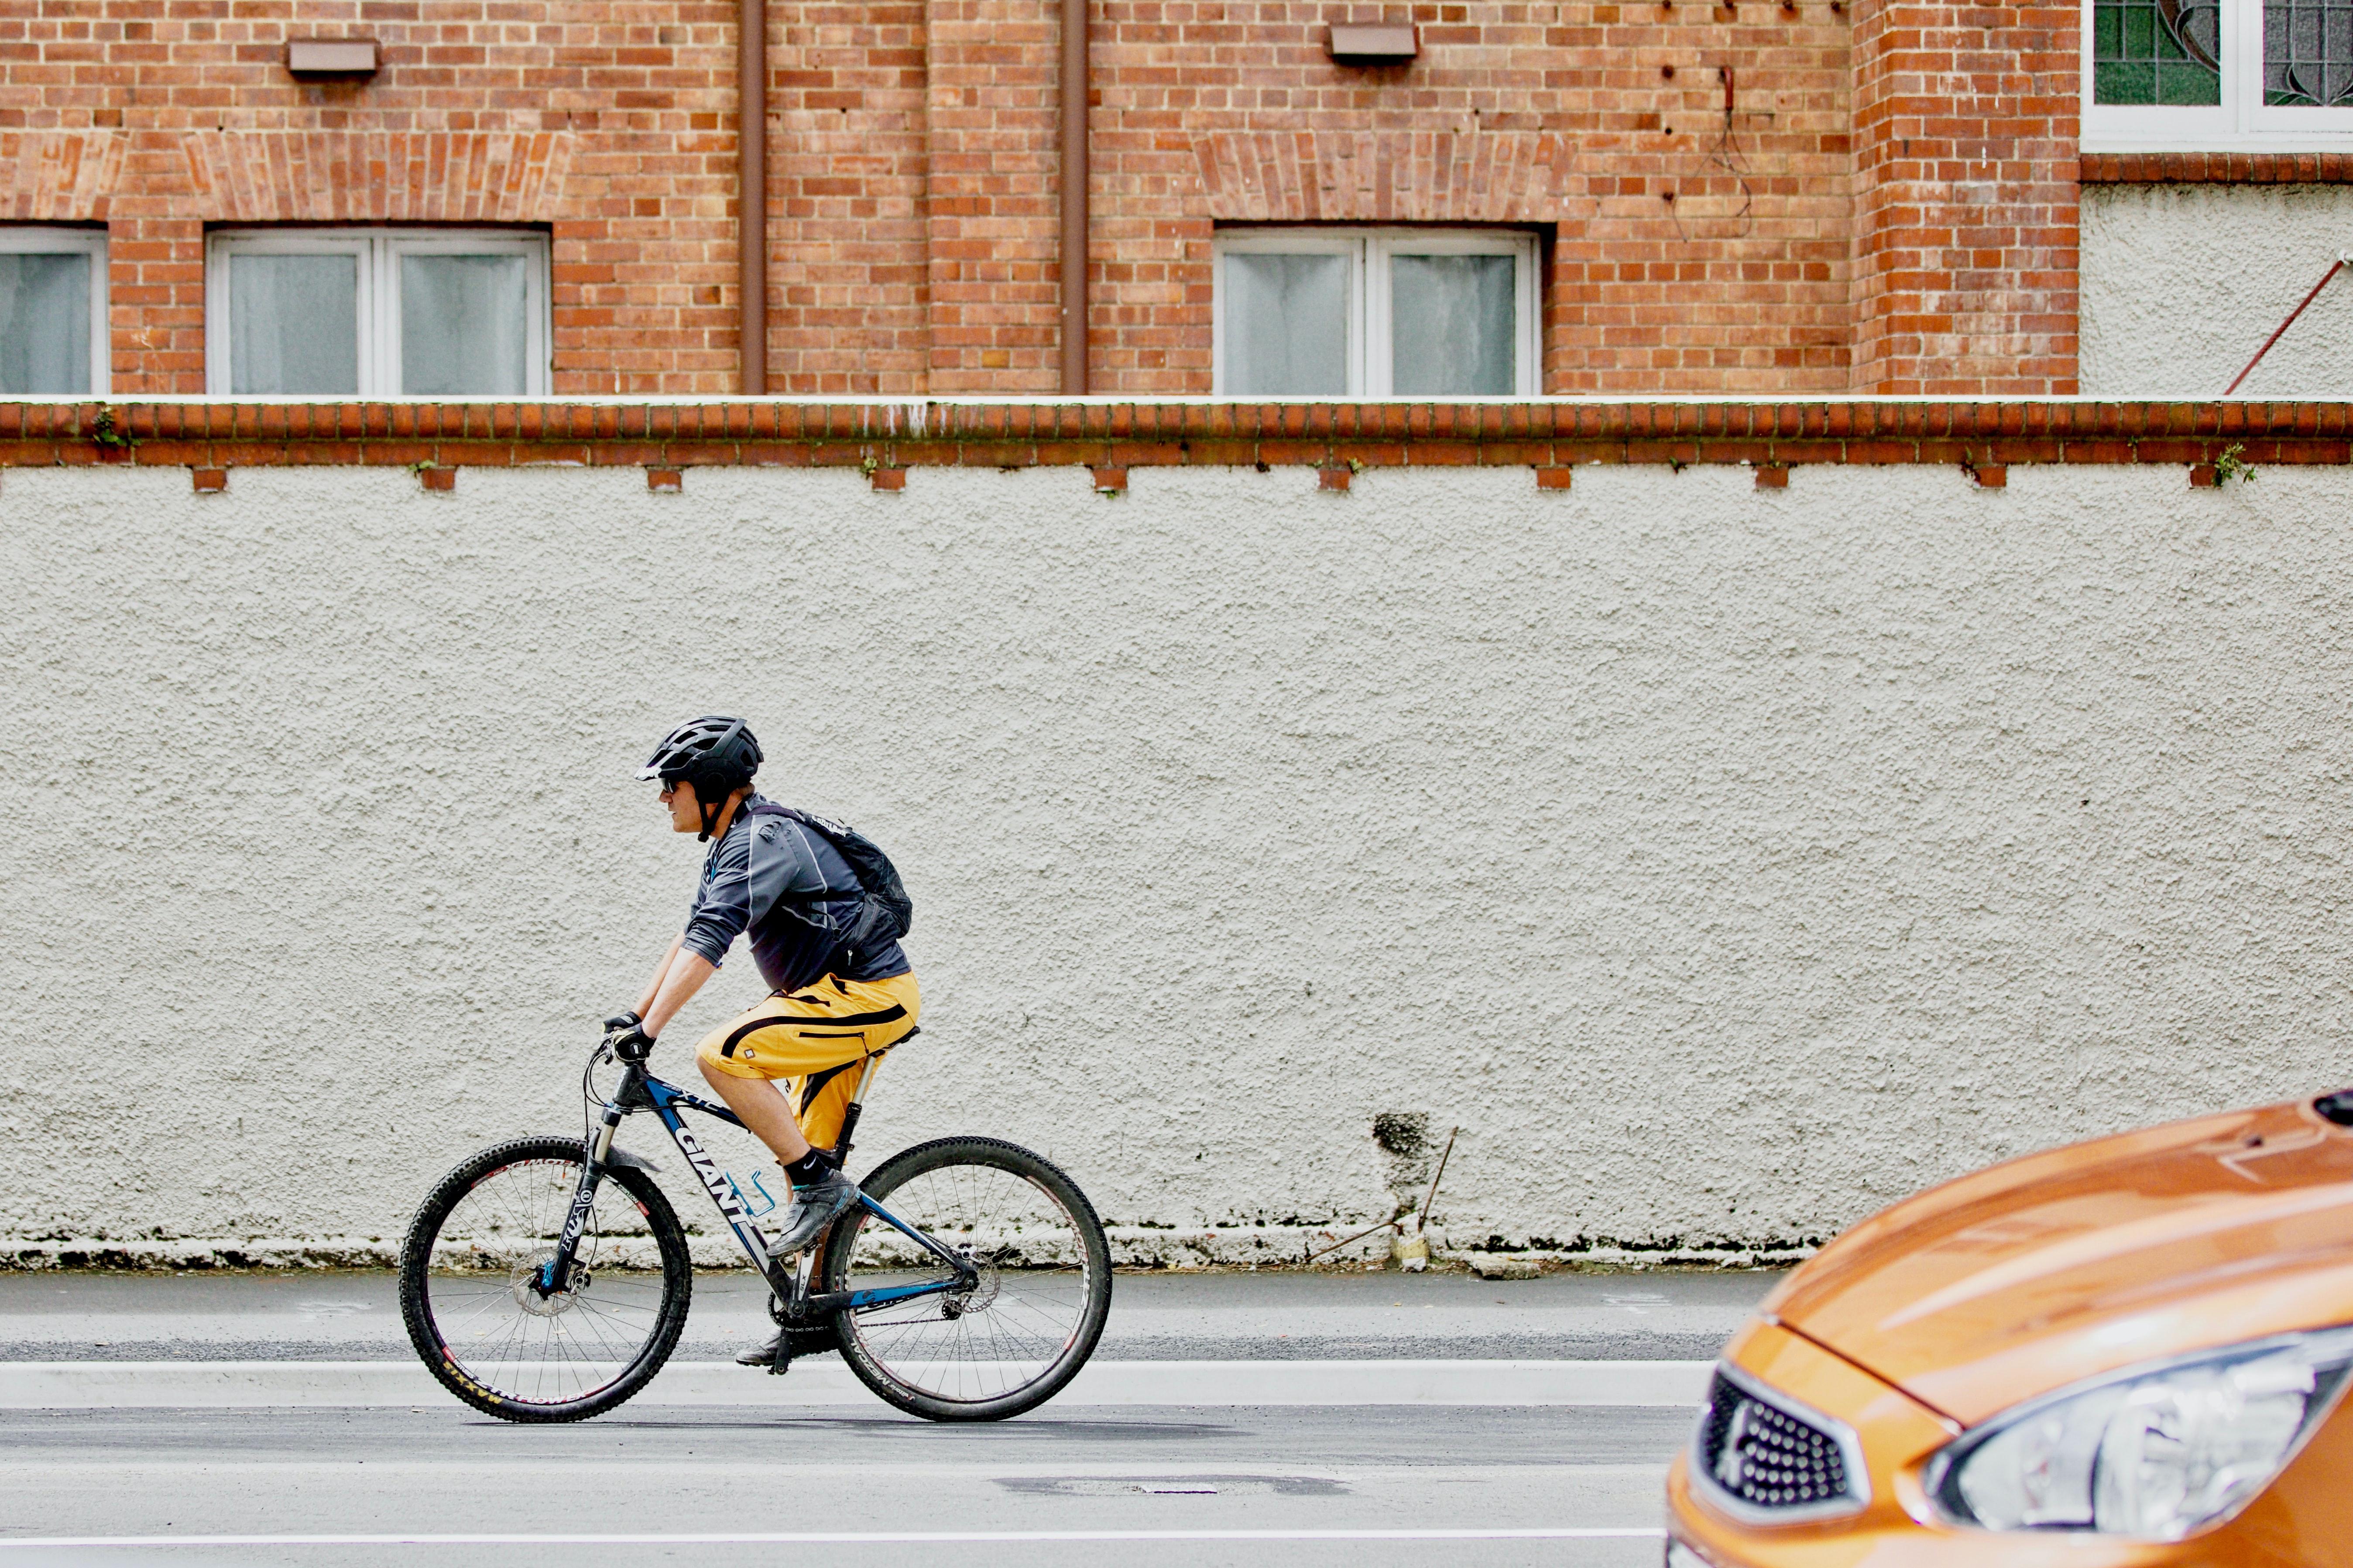 CO2排出量の少ない自転車 世界の取り組みは?日本の環境対策と比較 し再確認しよう